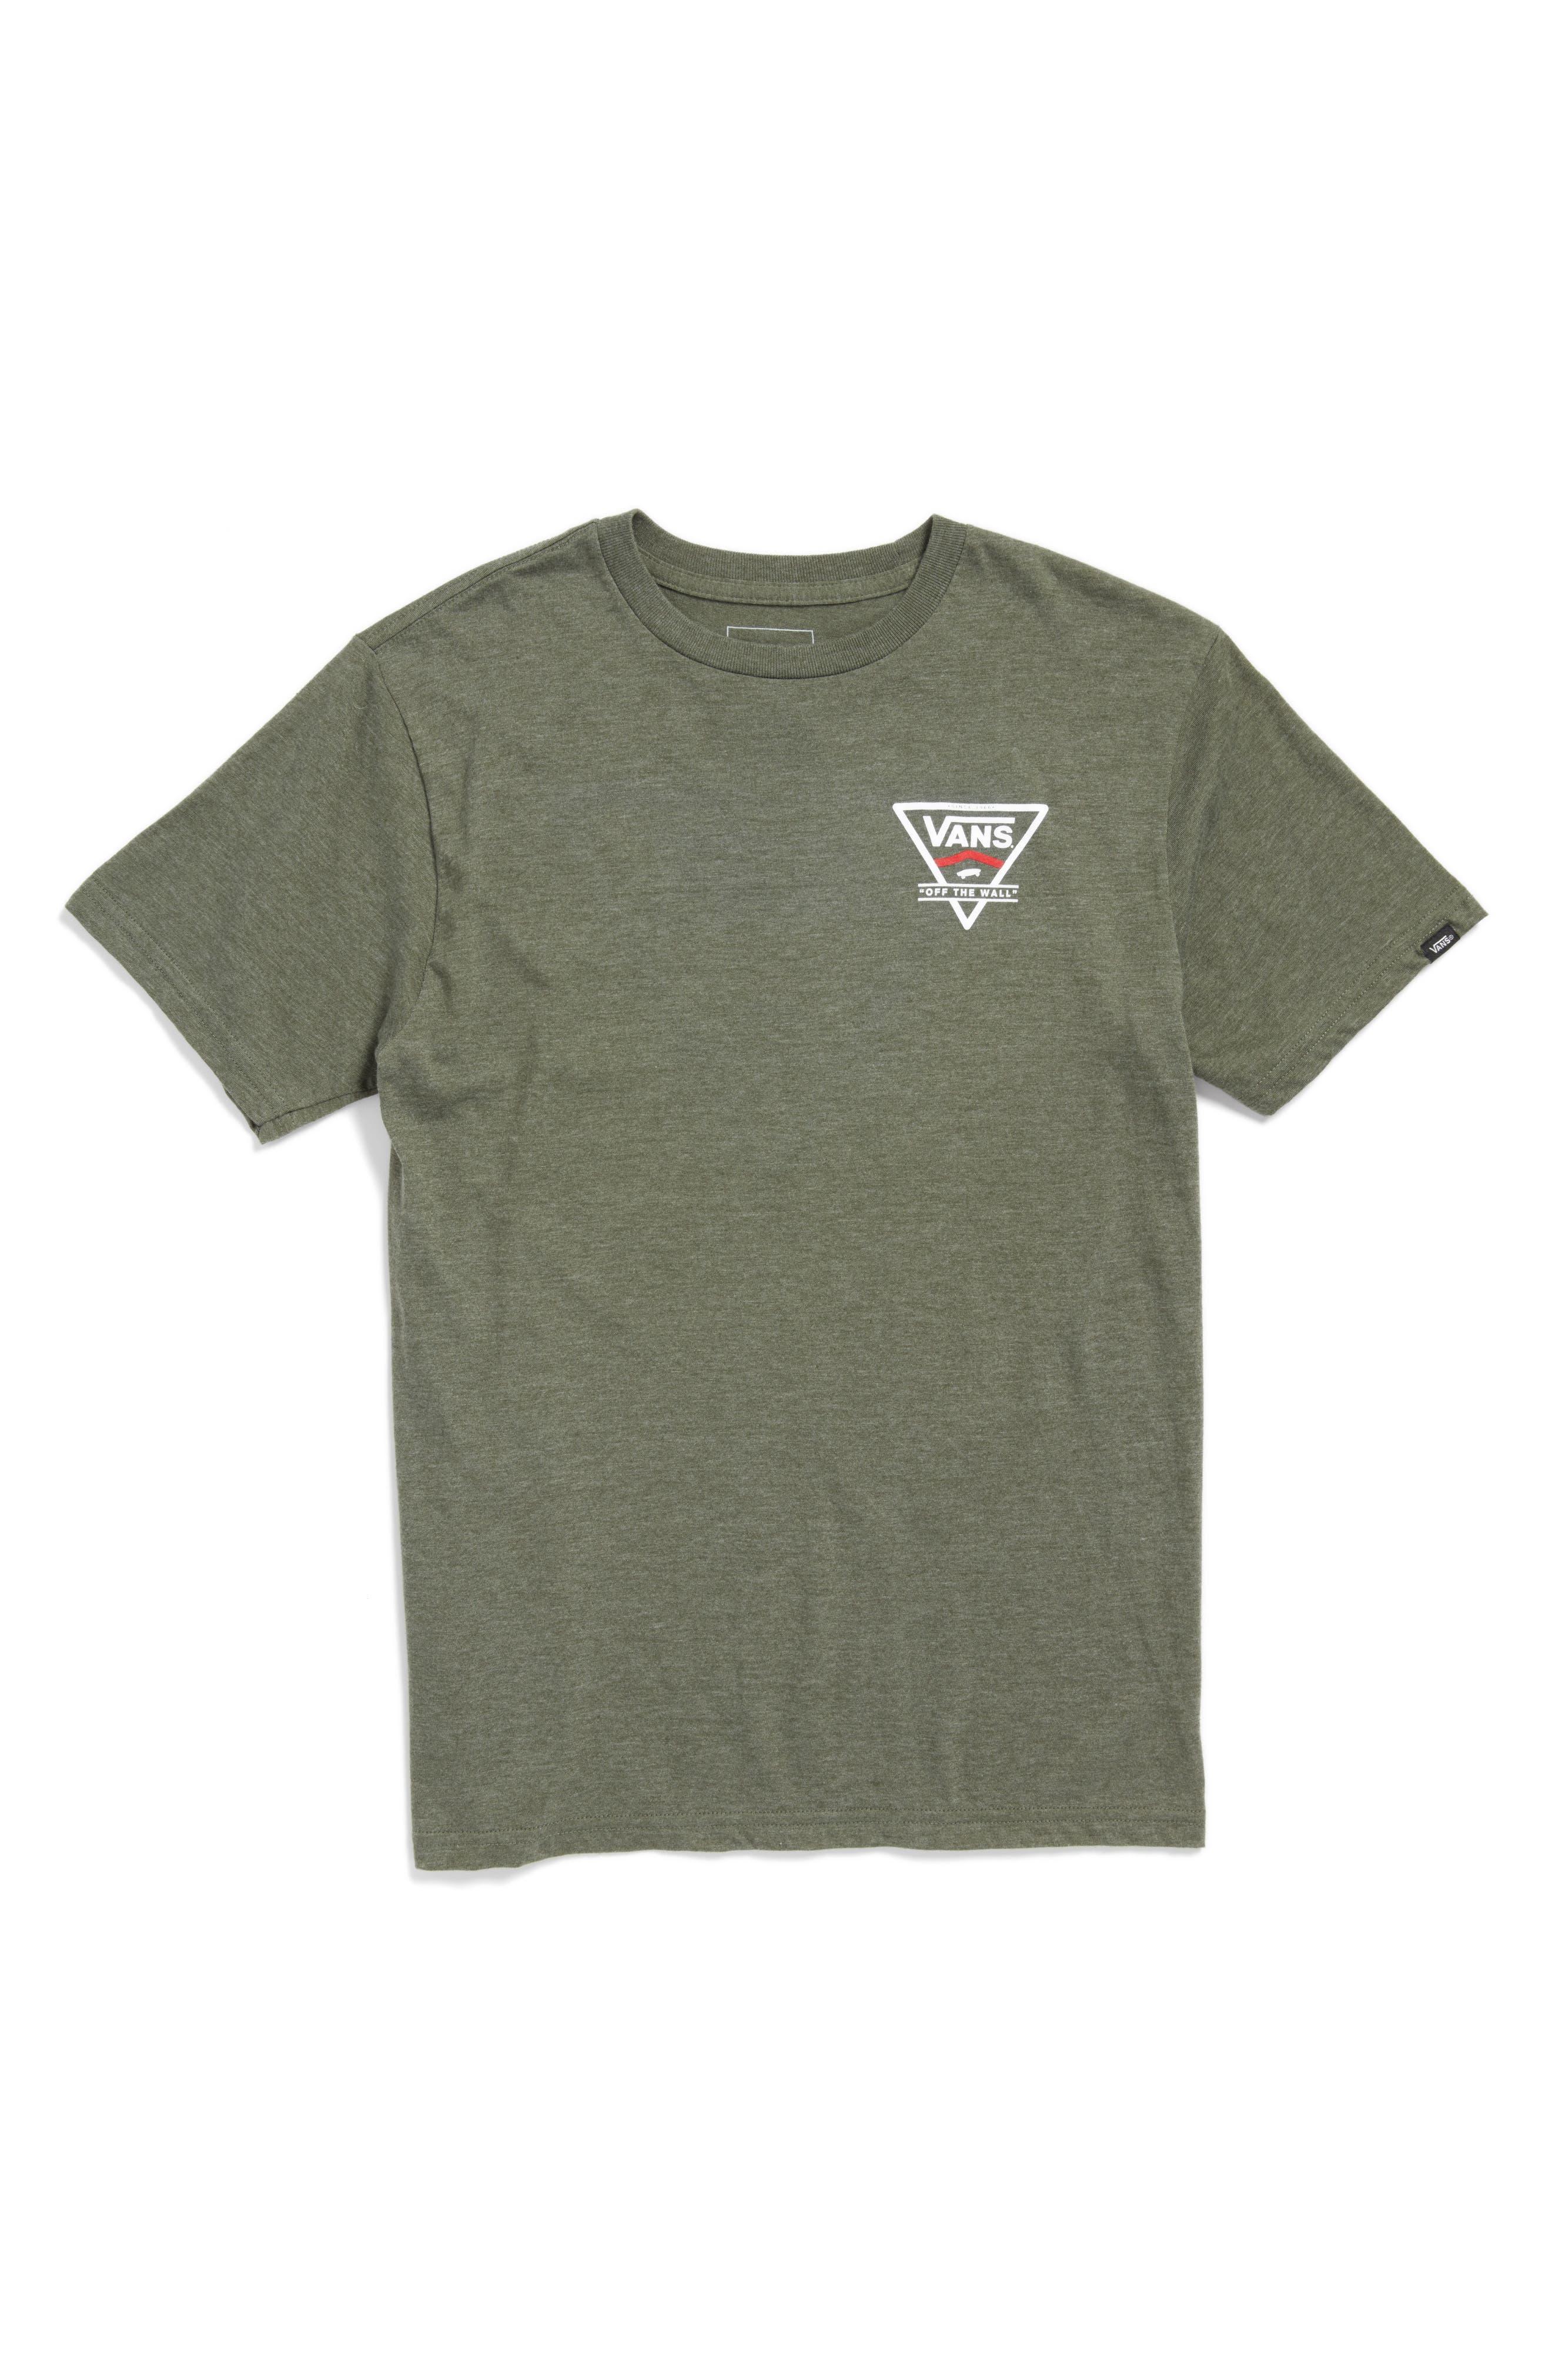 Vans Classic Stripe Graphic T-Shirt (Big Boys)